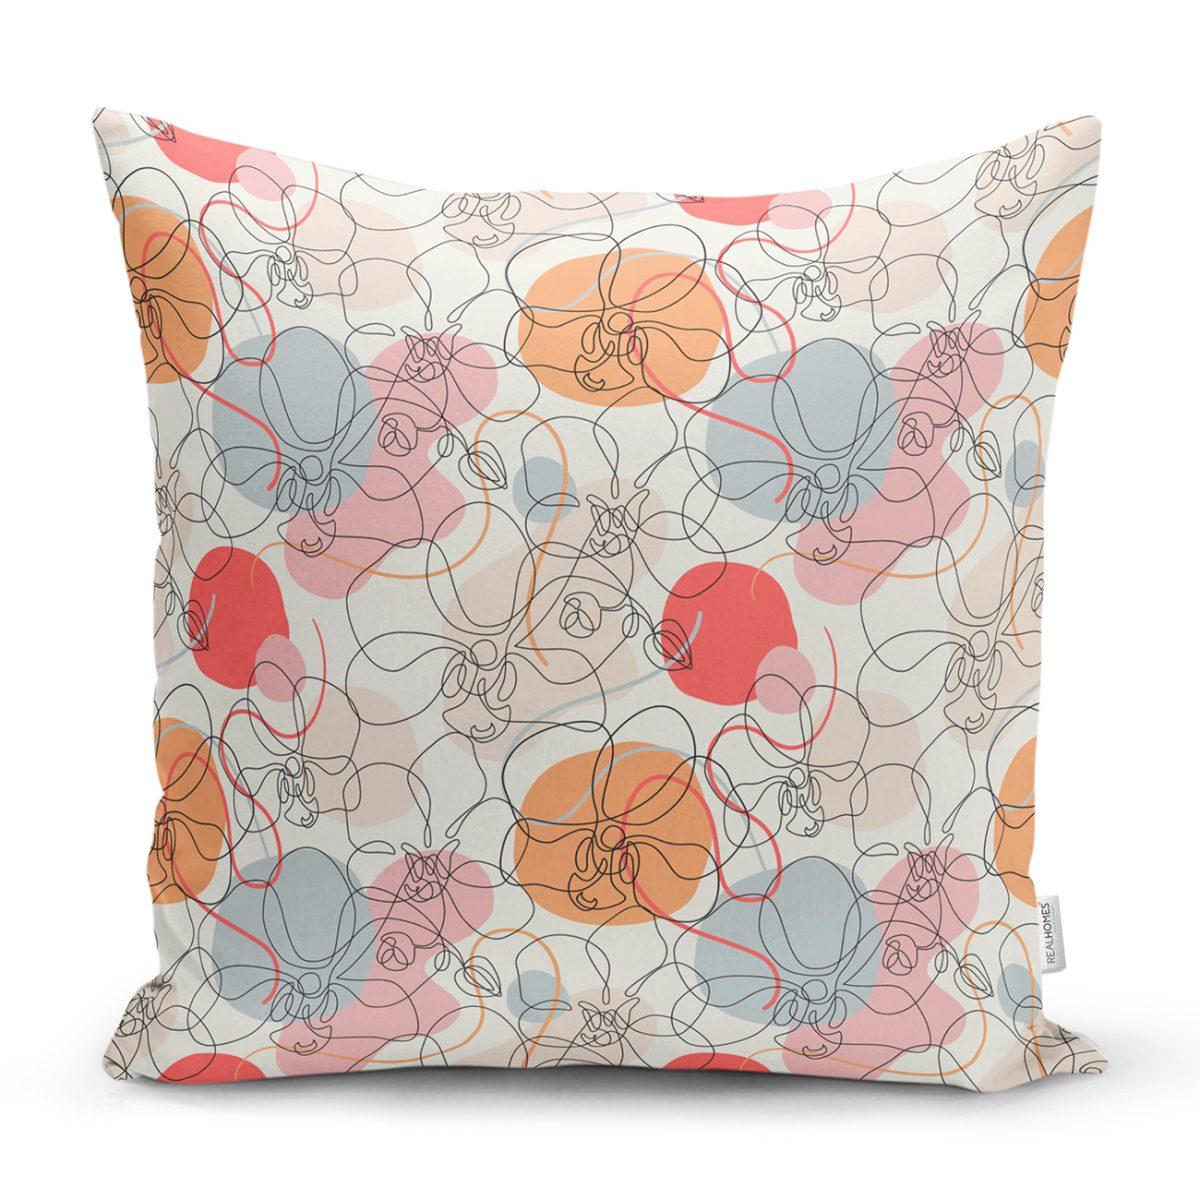 Kırmızı Ve Turuncu Puantiyeli Zeminde Karakalem Çiçek Motifli Kırlent Kılıfı Realhomes